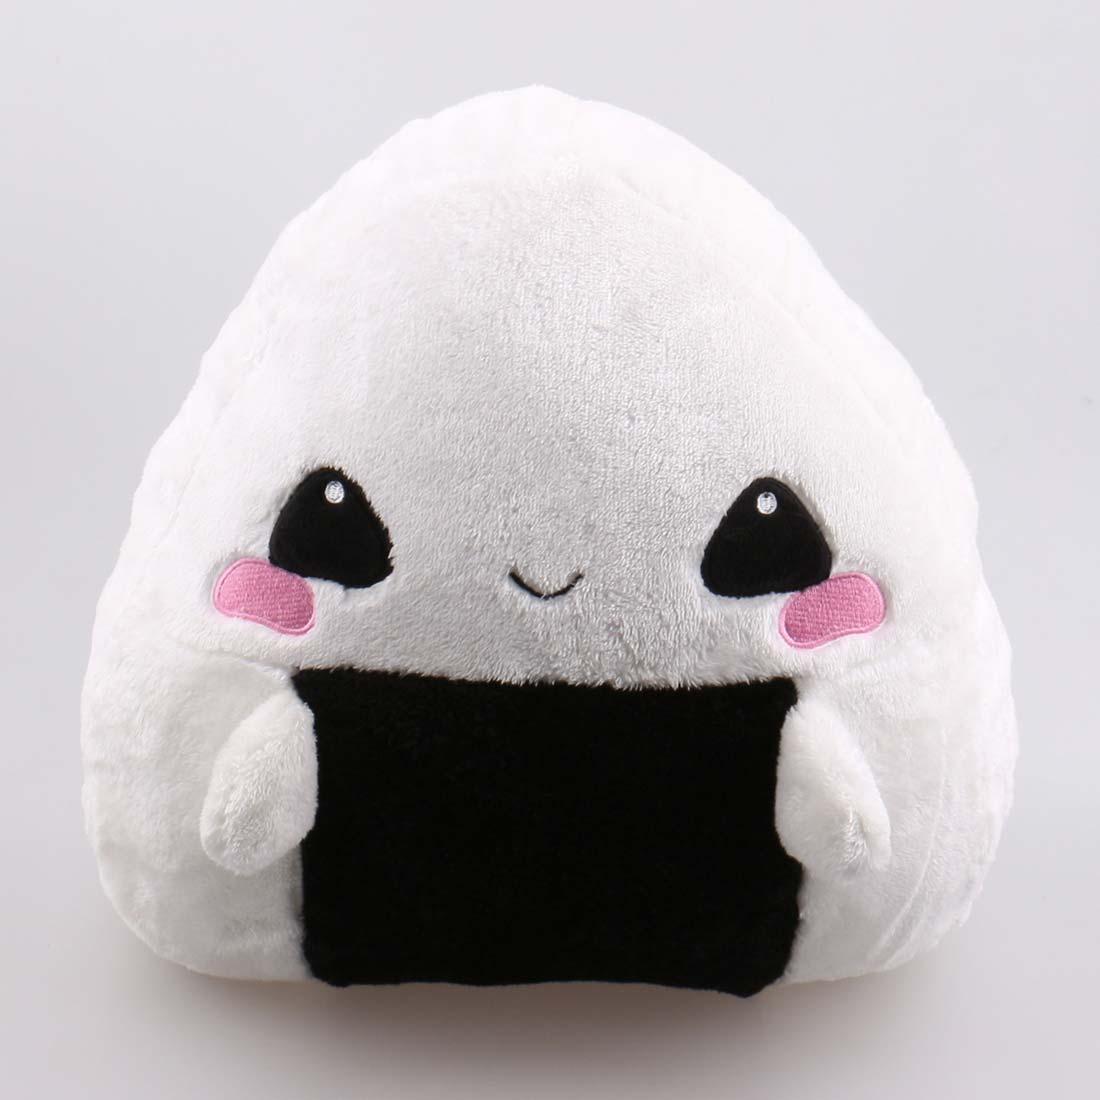 moodrush onigiri otoko pillow smiley japanese plush shop. Black Bedroom Furniture Sets. Home Design Ideas